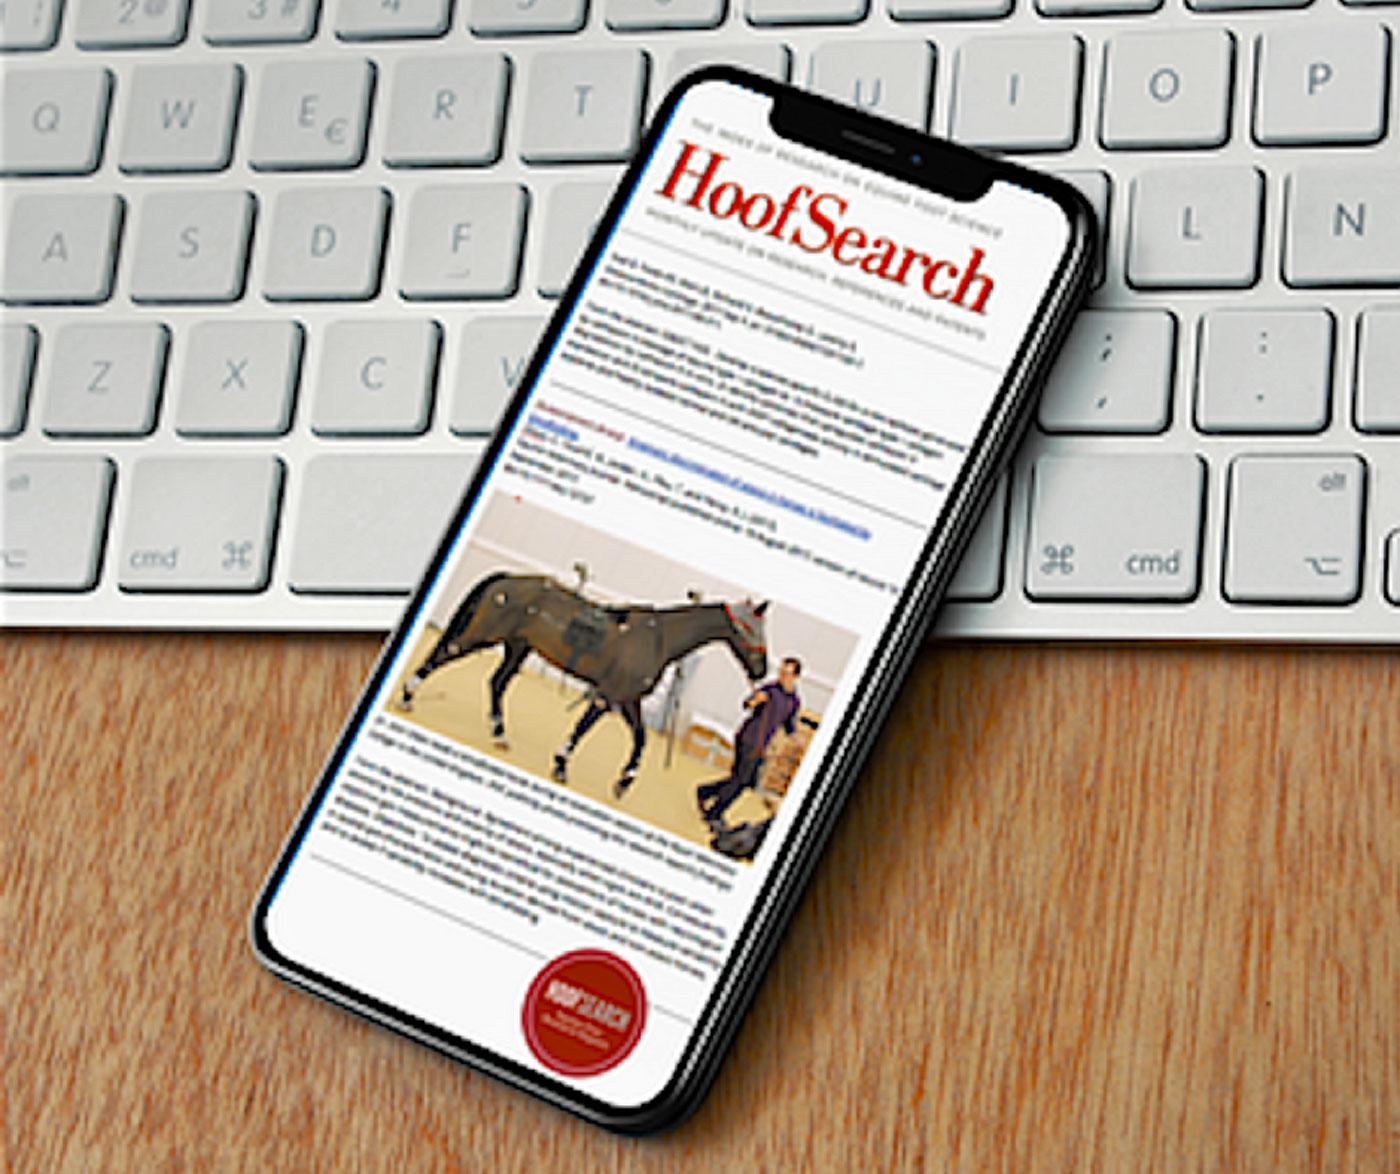 HoofSearch